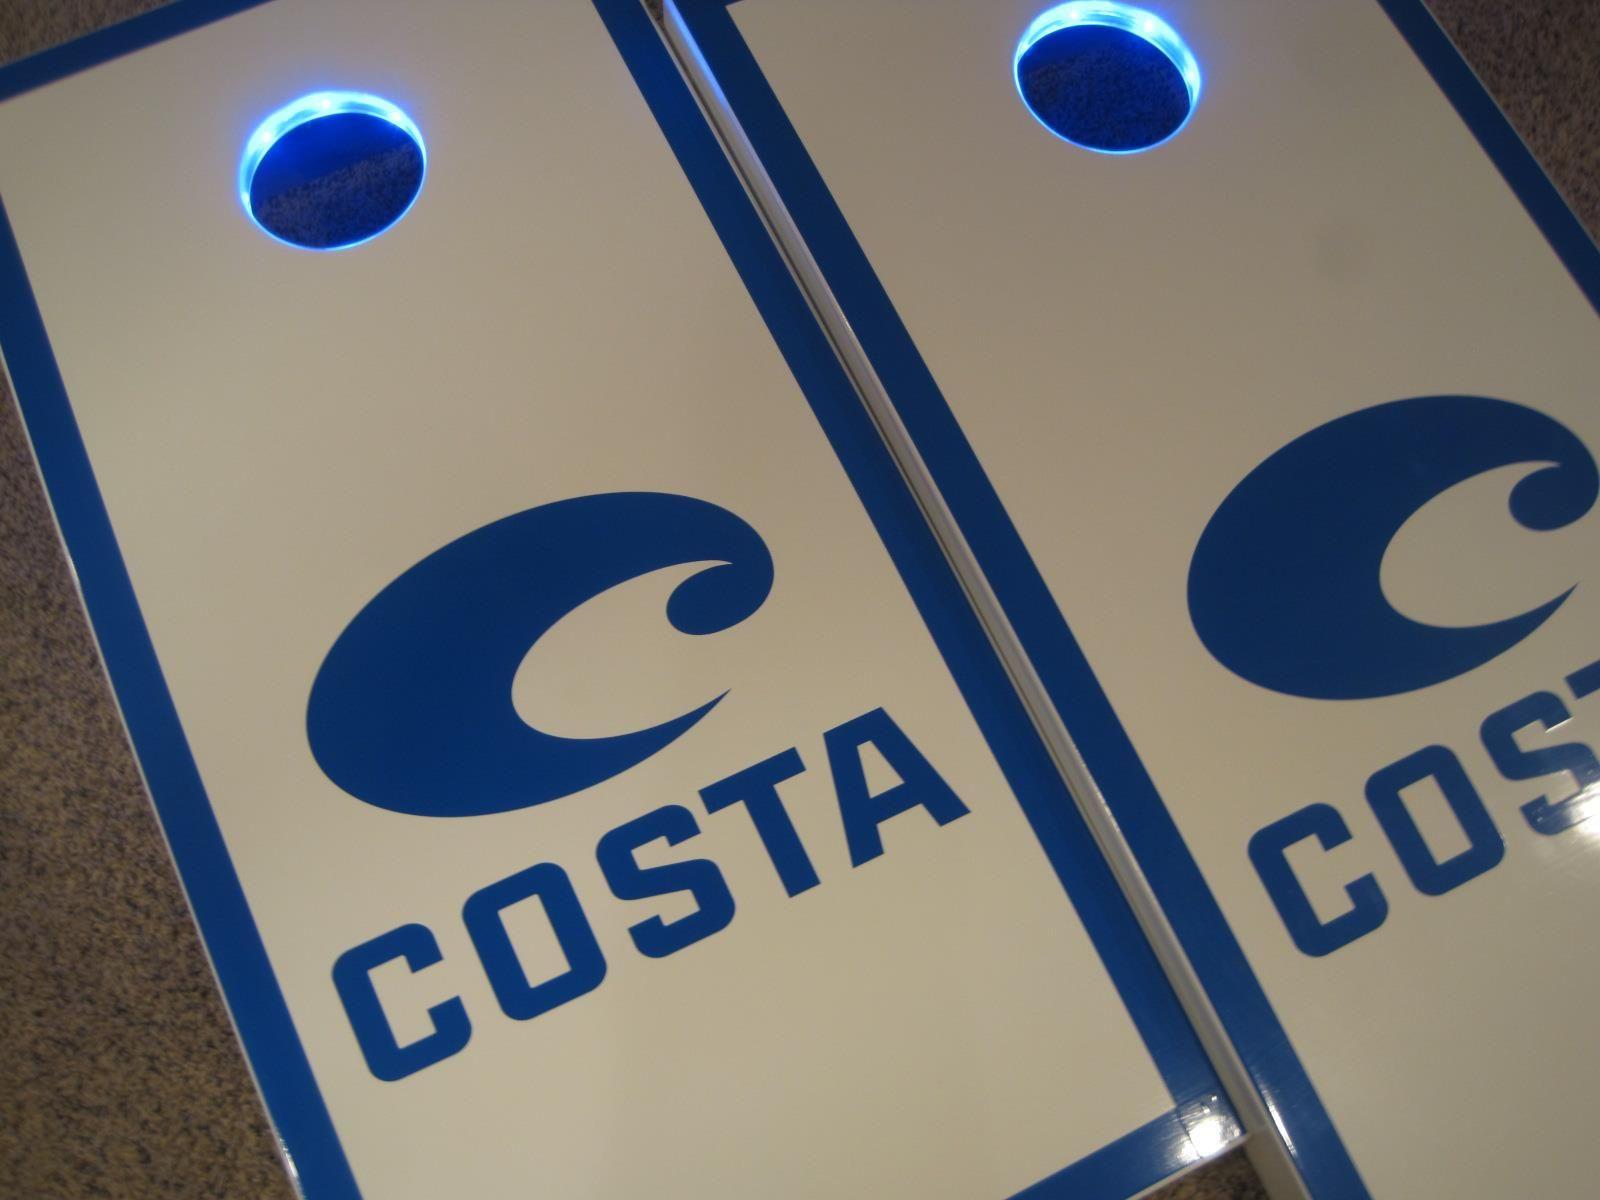 costa cornhole boards - Cornhole Sets